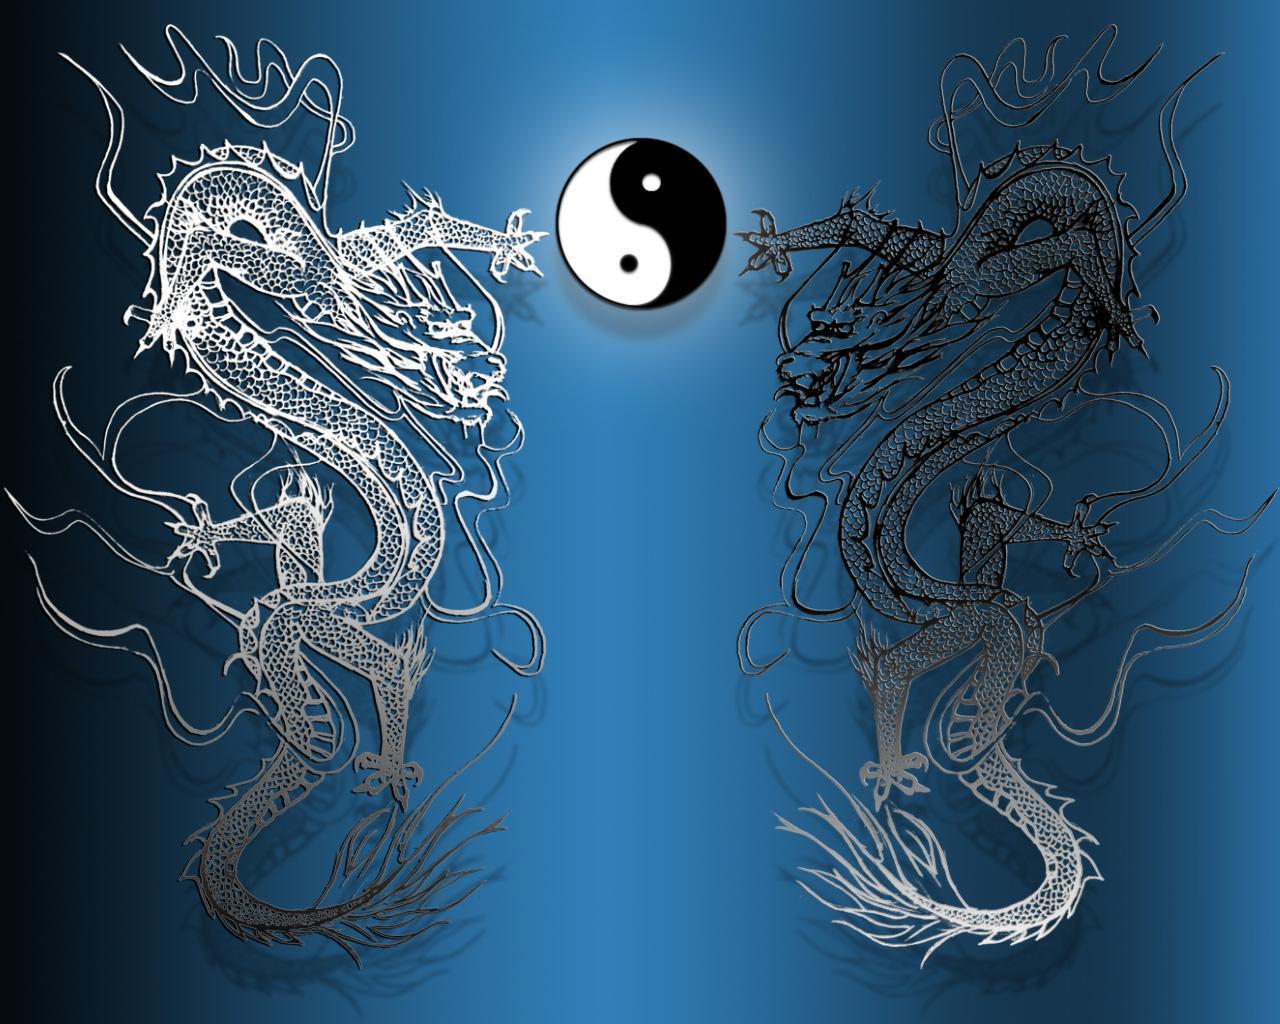 дракон близнец картинка необходимо